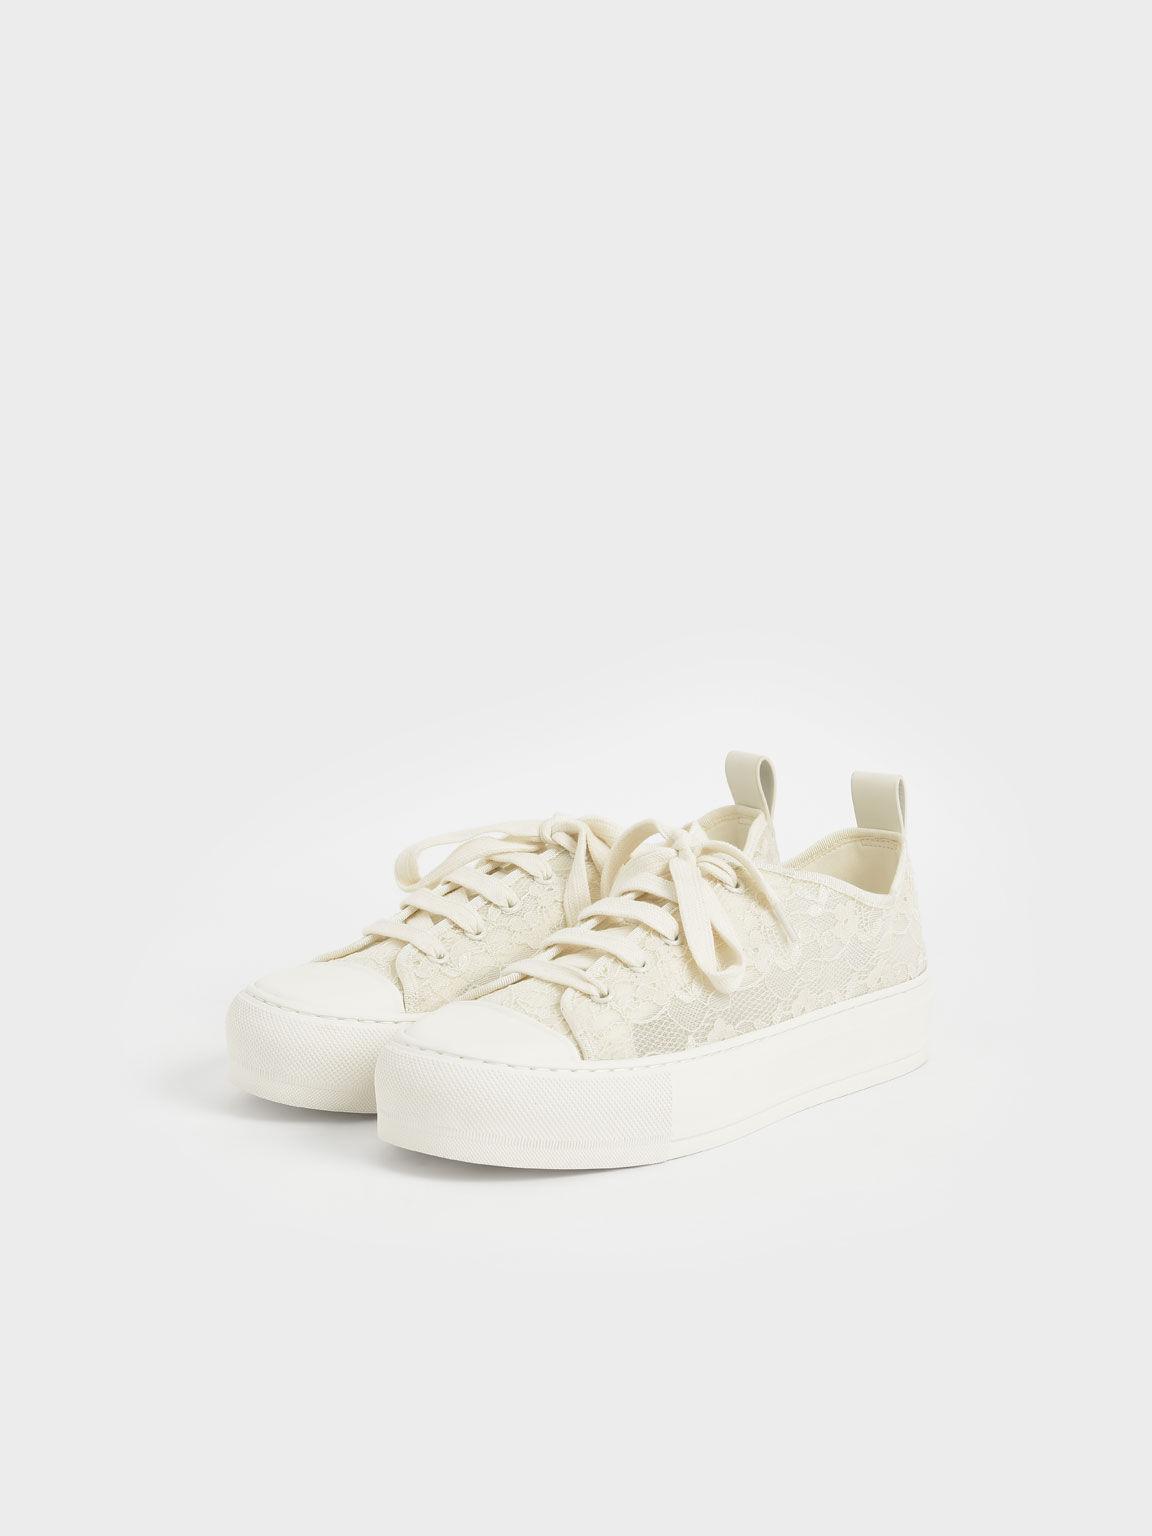 Lace Low-Top Sneakers, Cream, hi-res